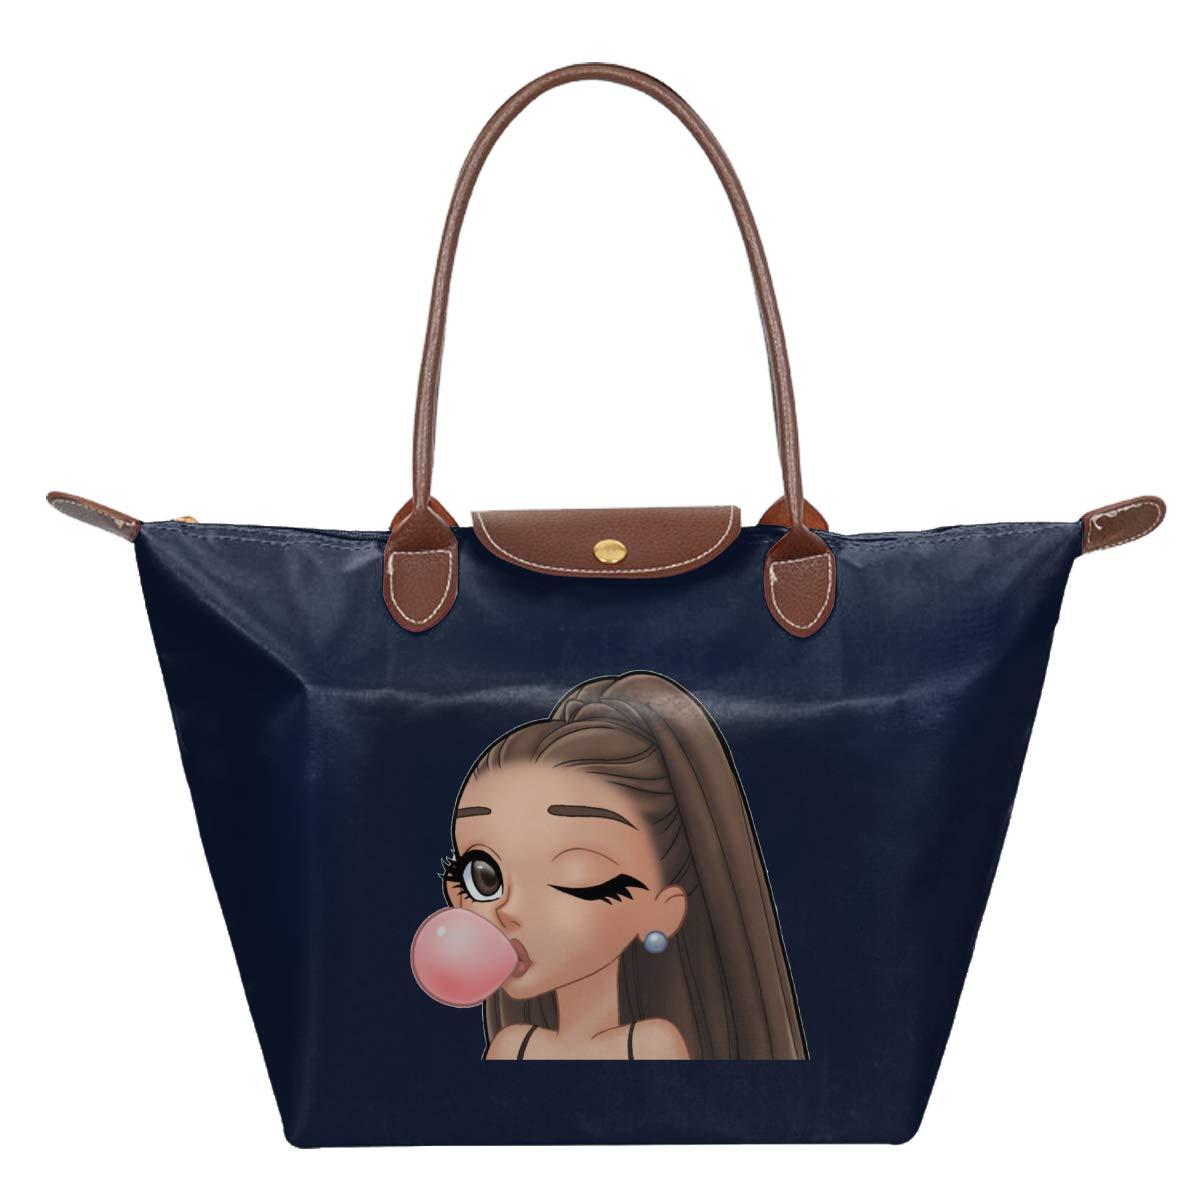 Ari-Ana Cute Gran-De Waterproof Leather Folded Messenger Nylon Bag Travel Tote Hopping Folding School Handbags